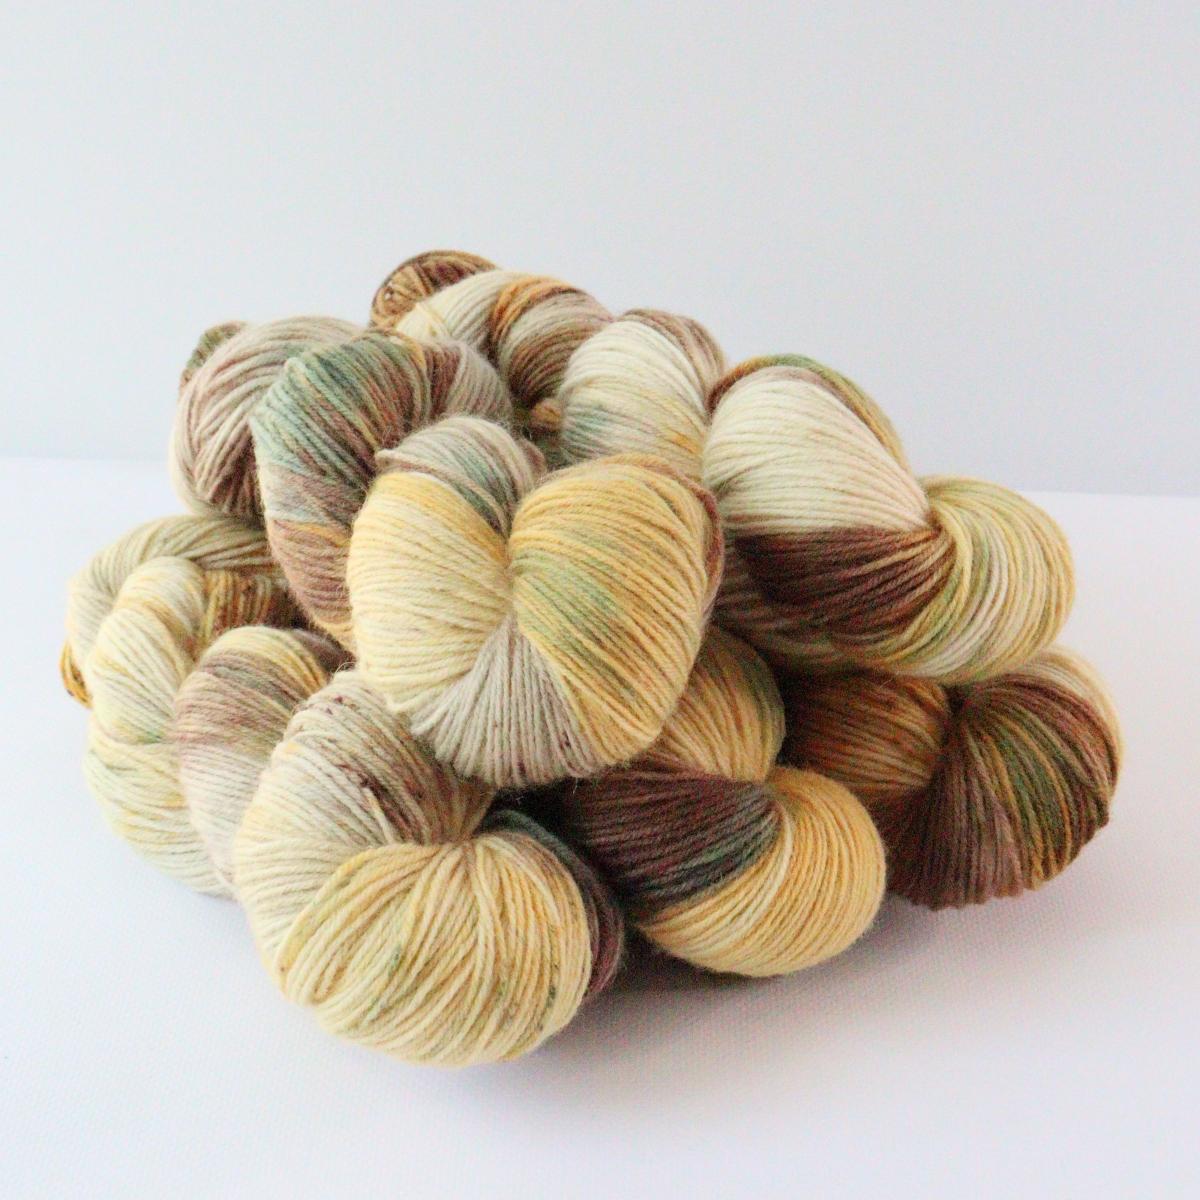 woodico.pro hand dyed yarn 088 1 1200x1200 - Hand dyed yarn / 088